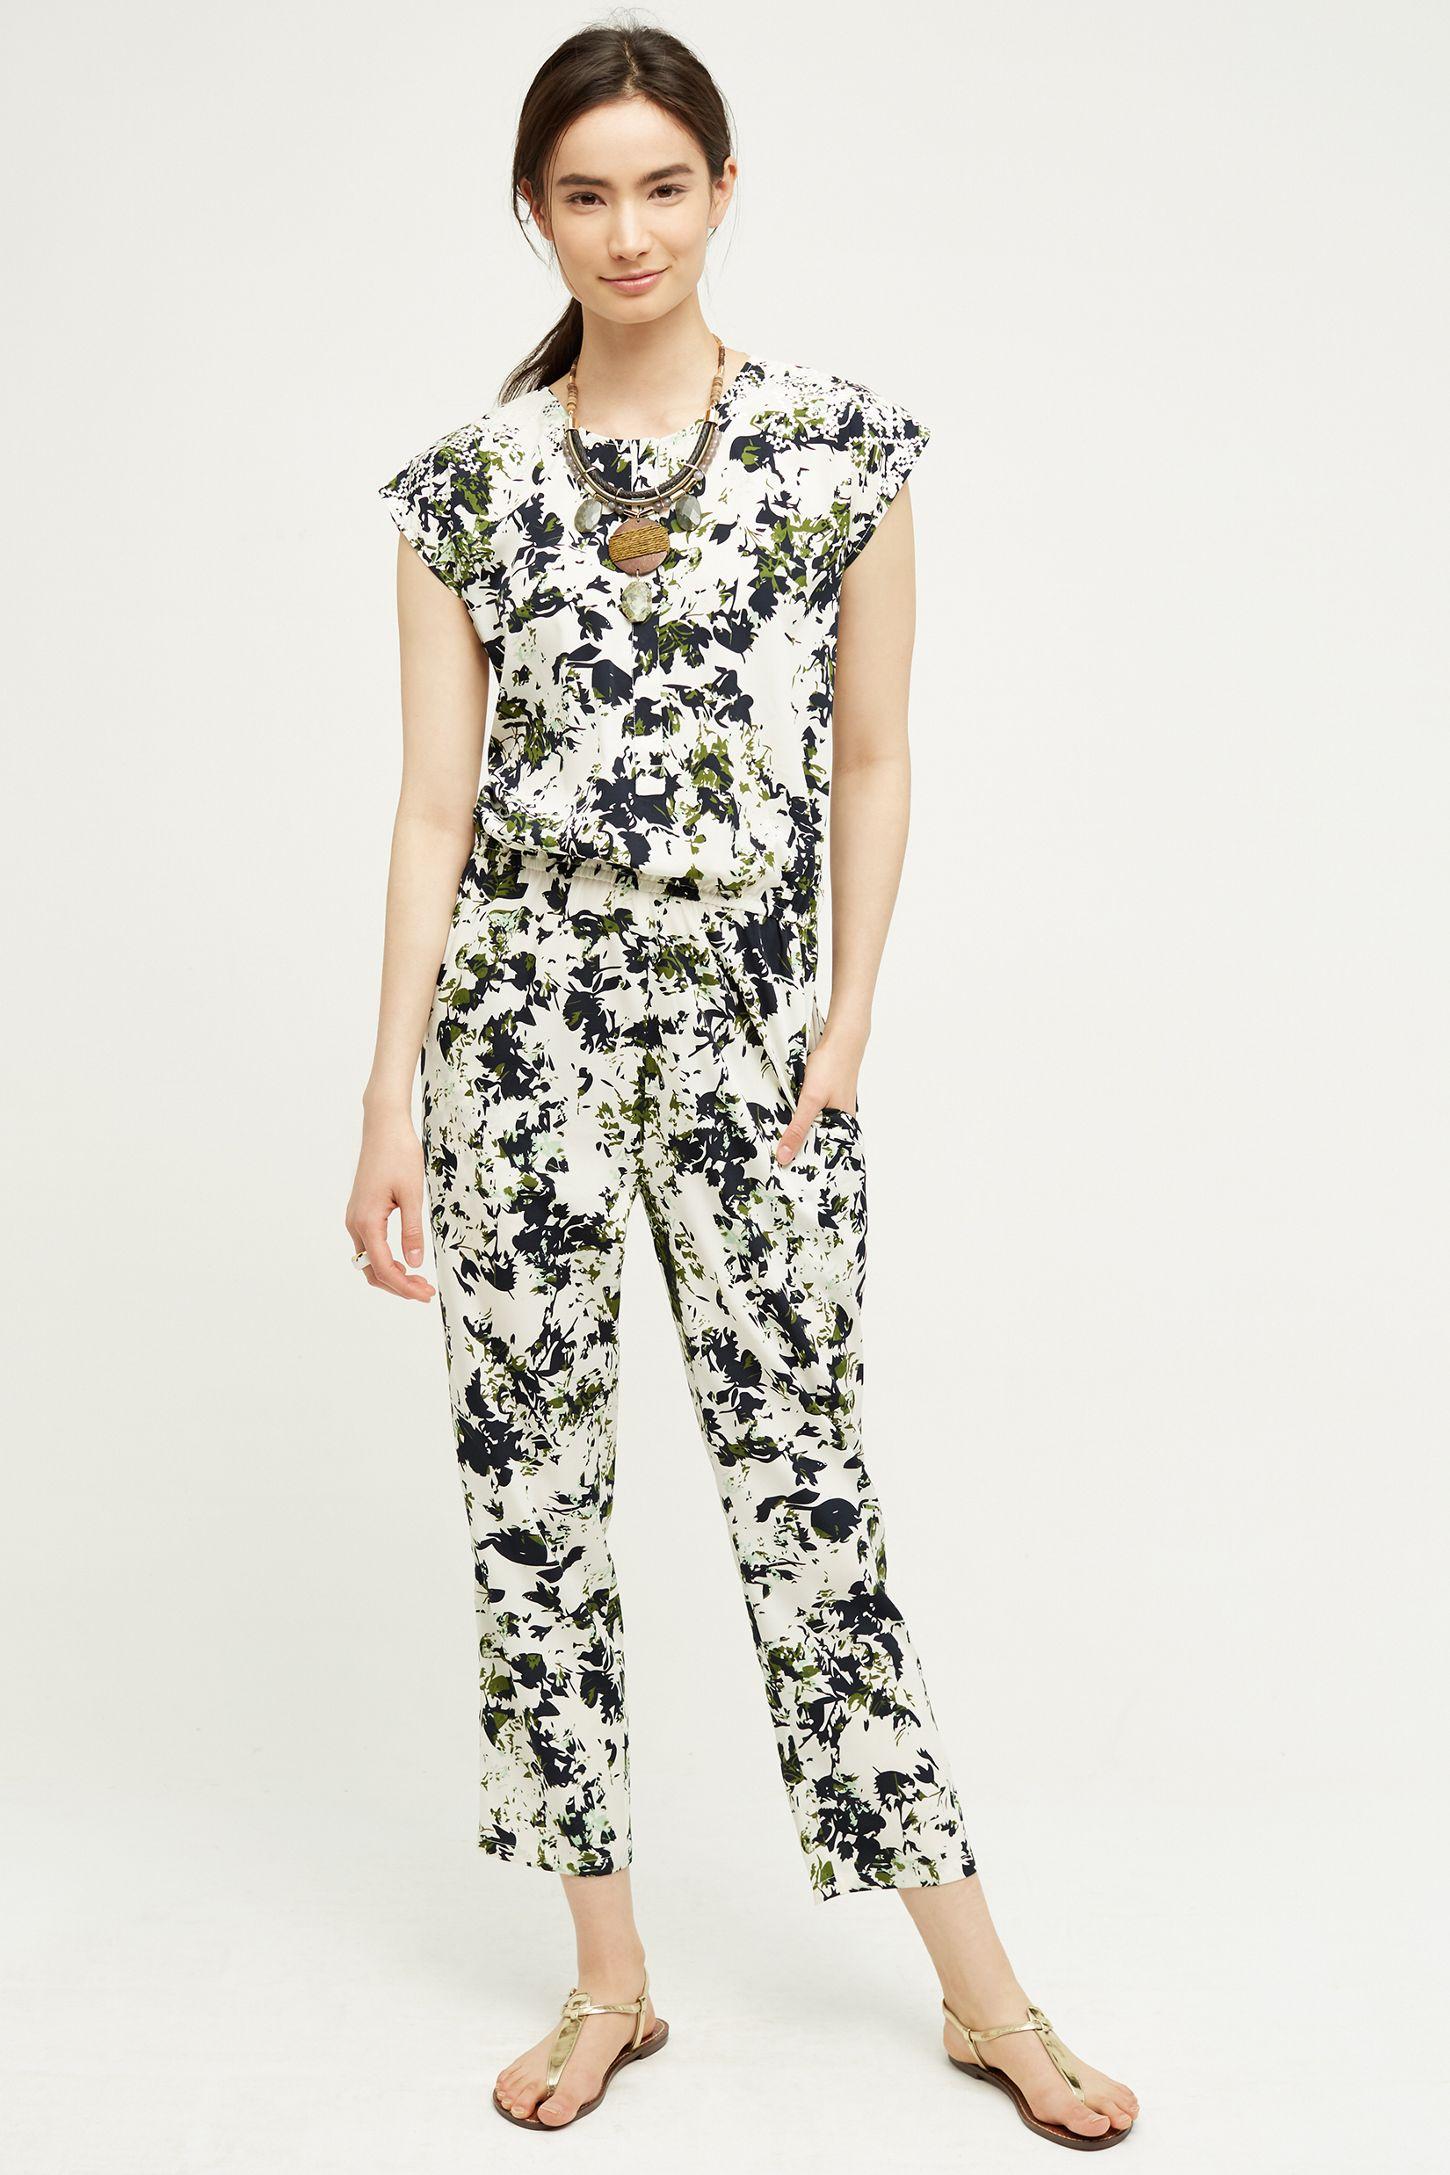 0be78f8f2e9f Aida Embroidered Jumpsuit